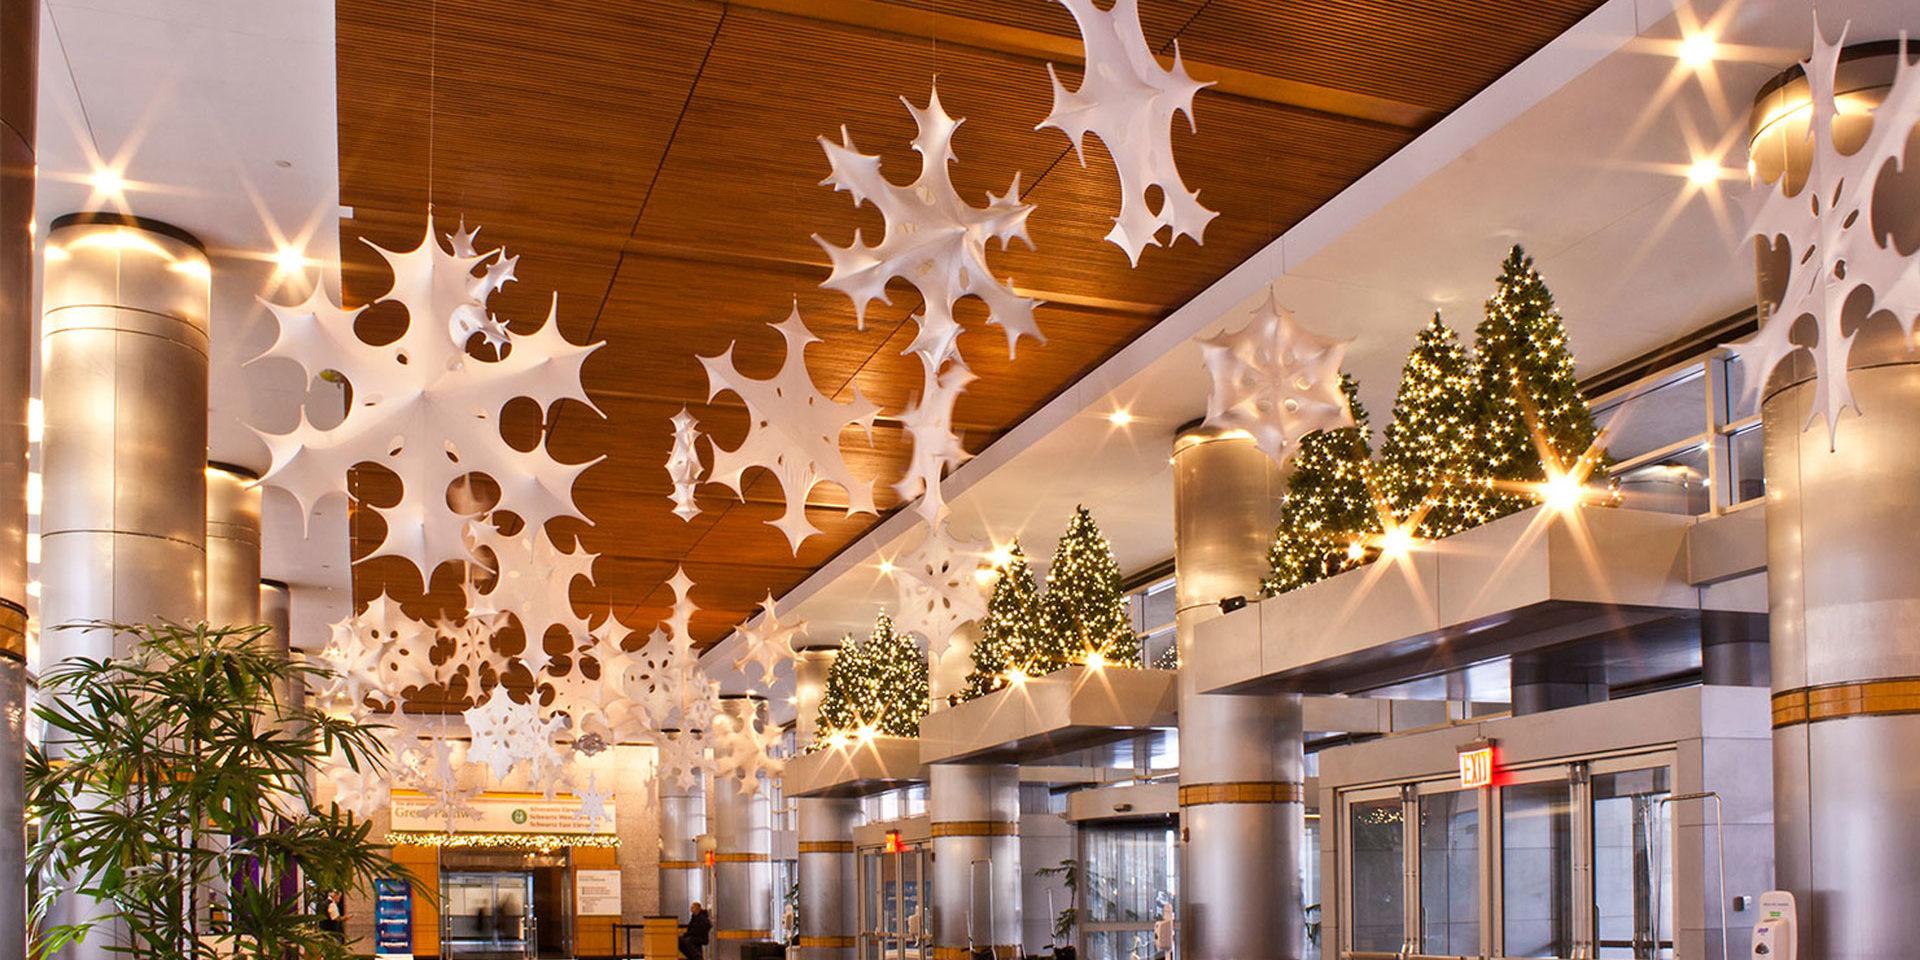 Festive Decorative Lighting for Corporate Buildings | MK